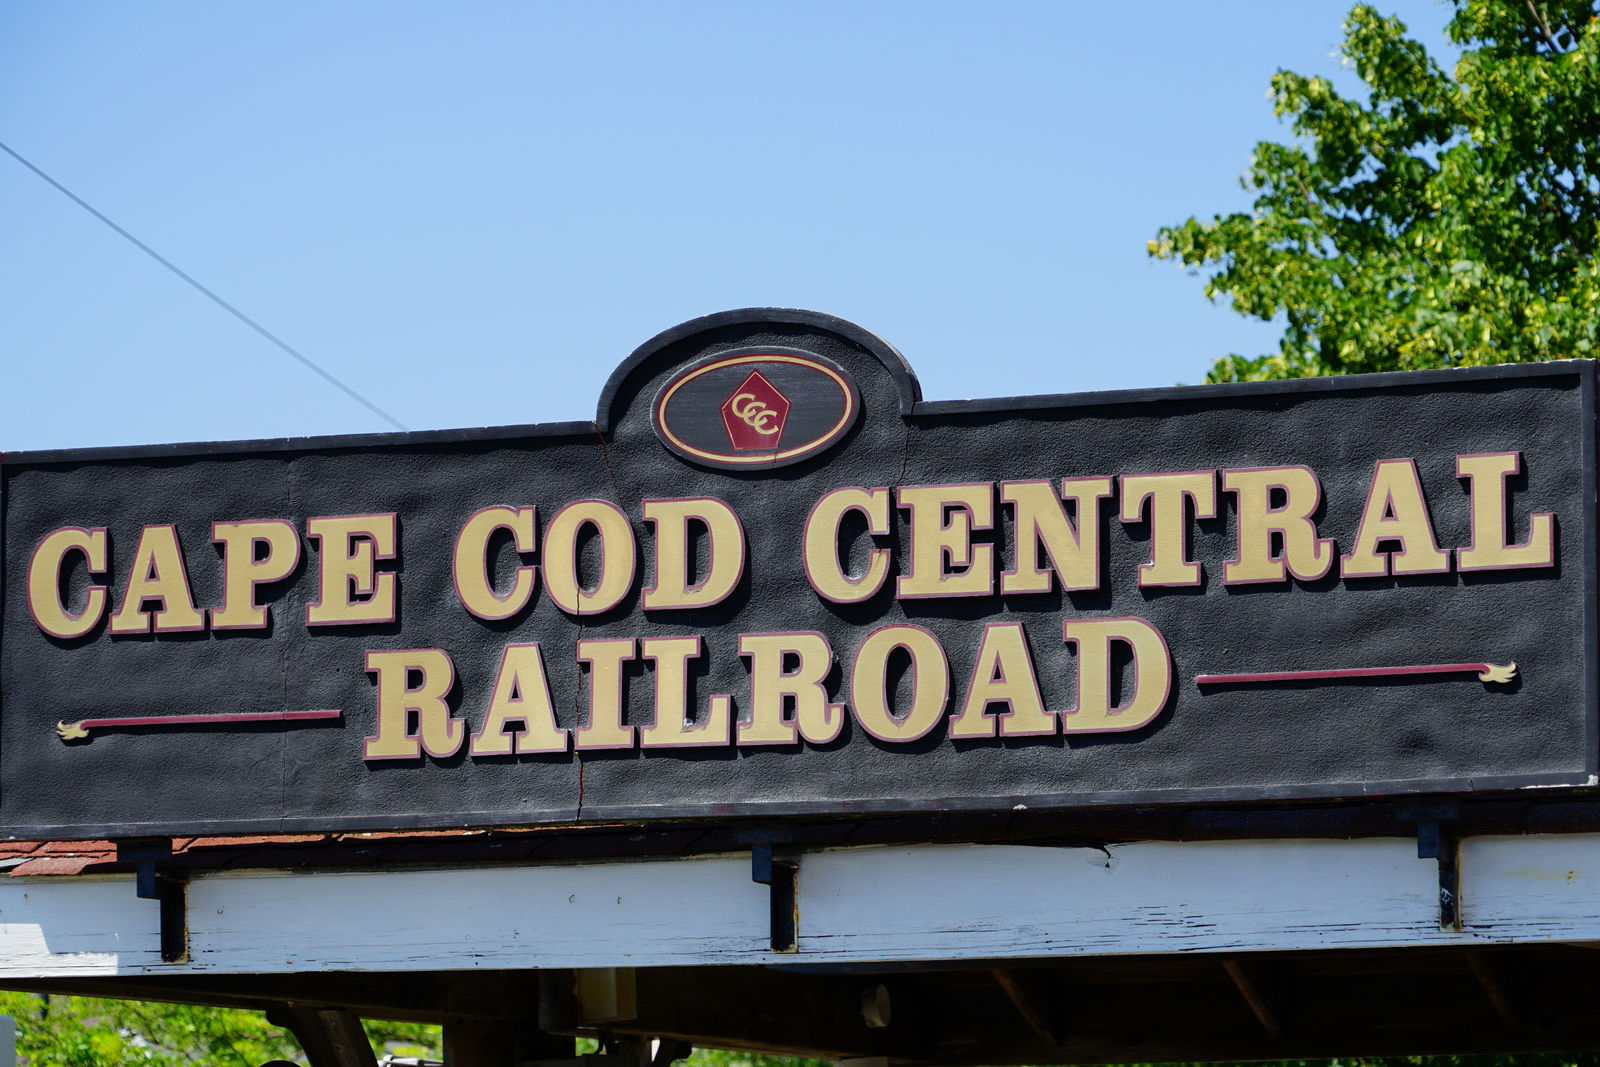 Cape Cod Central Railway Anura Guruge Sony a7II